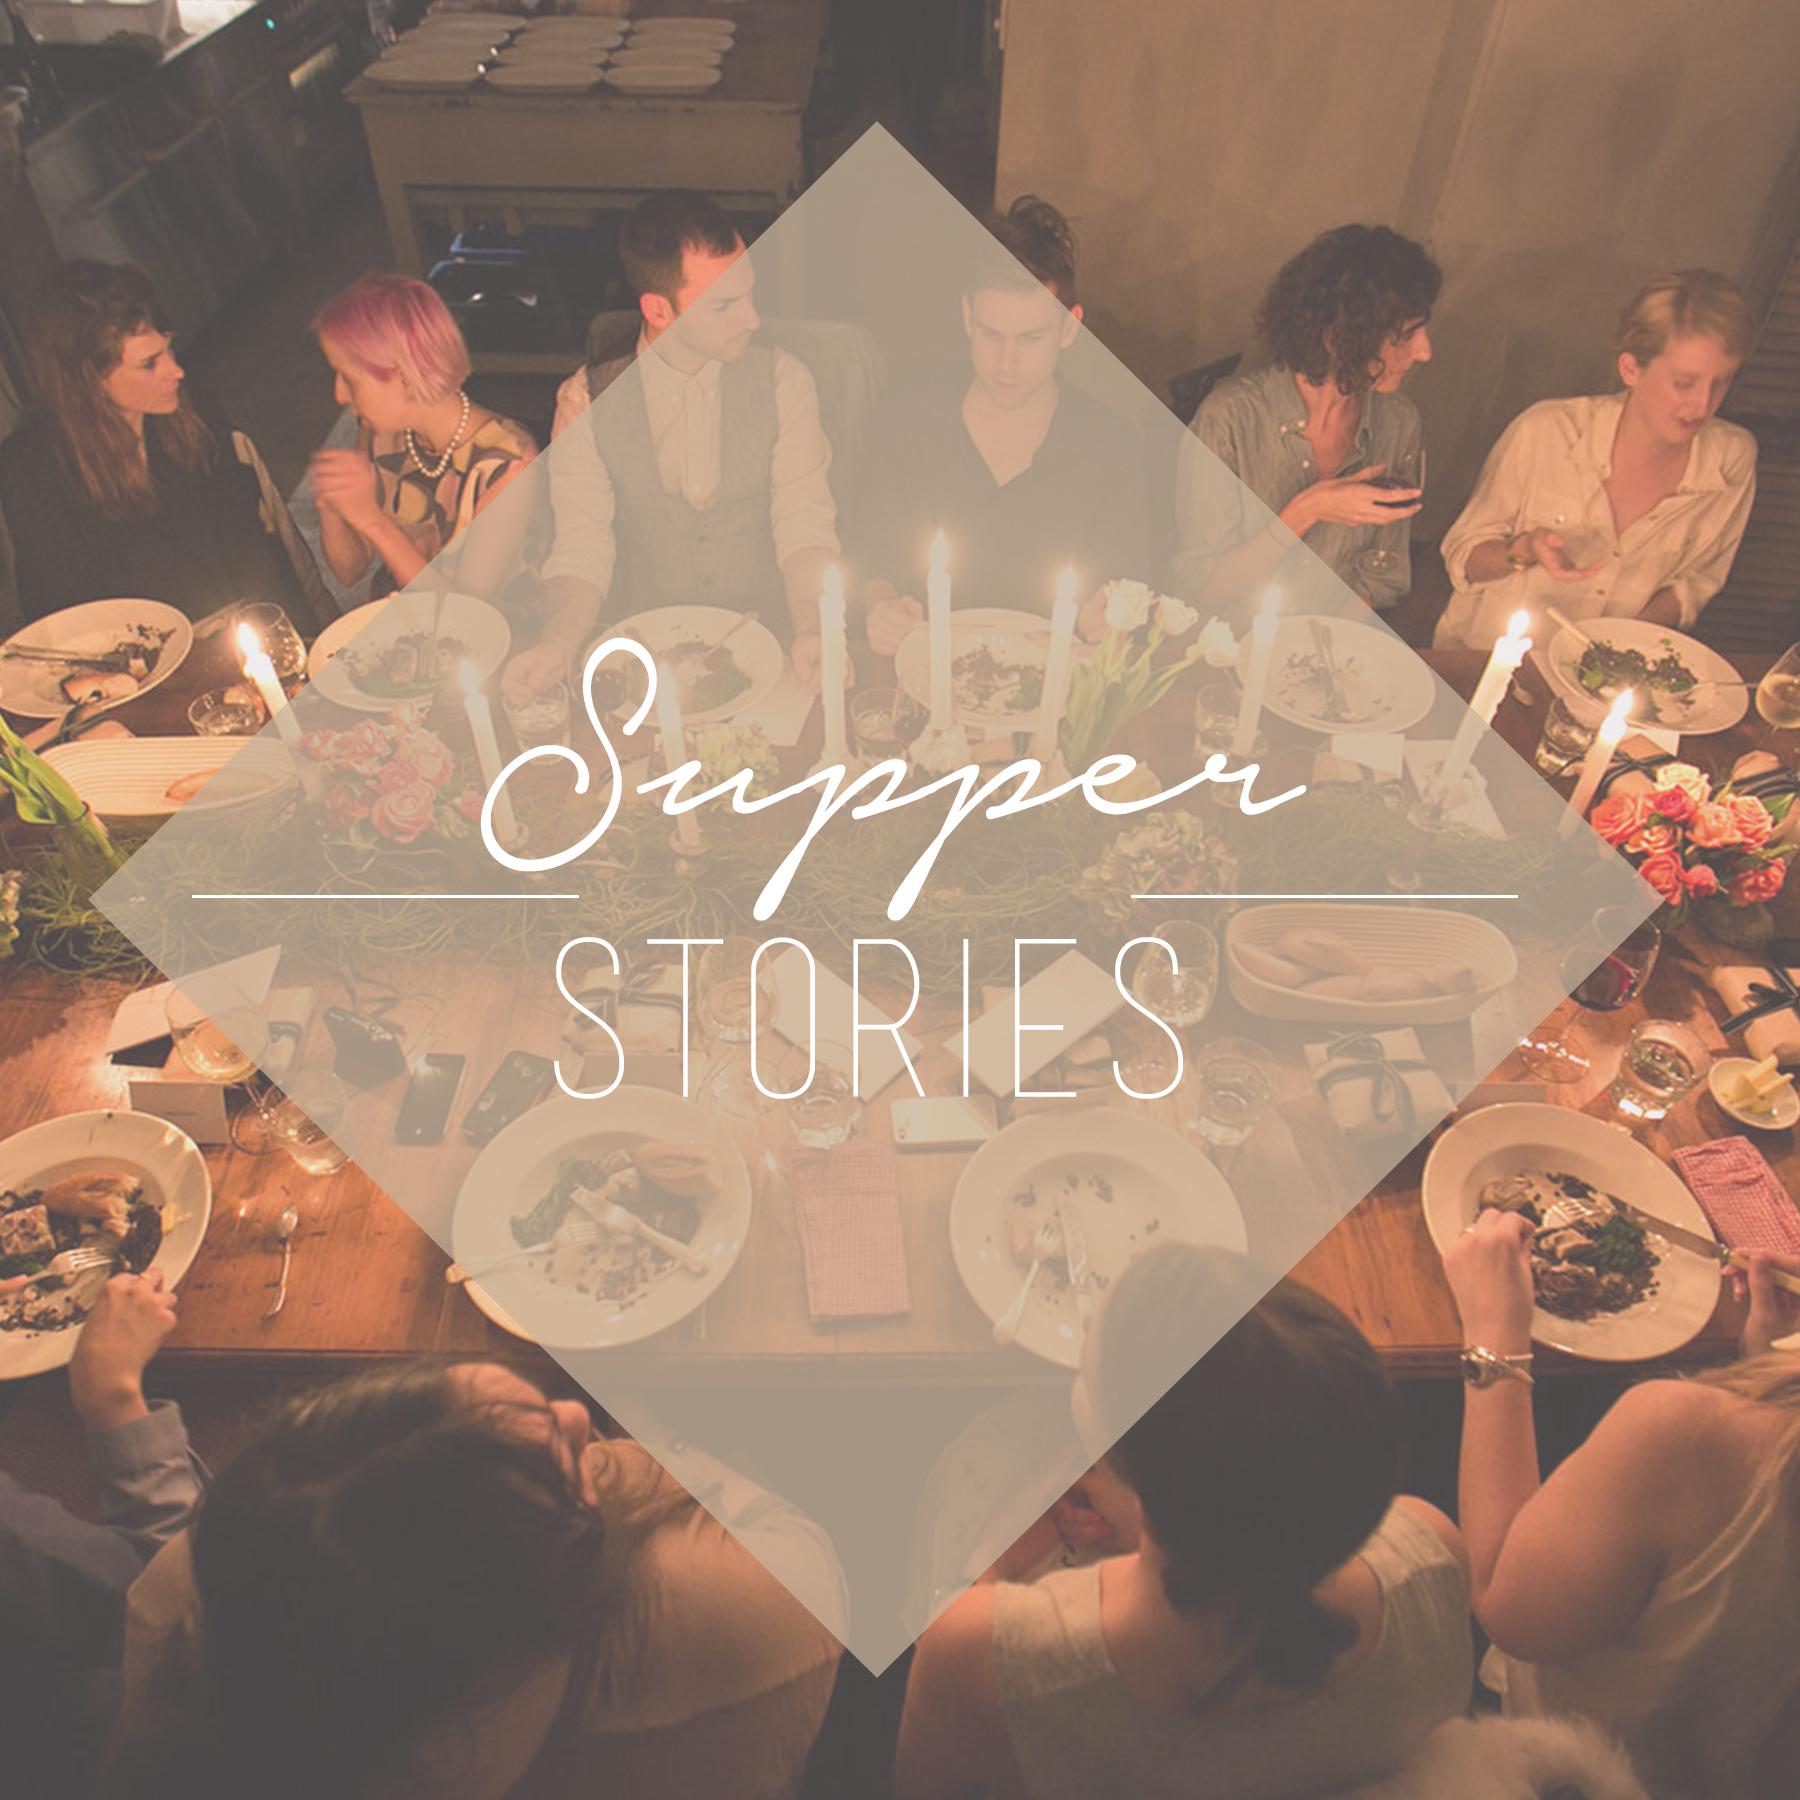 Supper_Stories.jpg